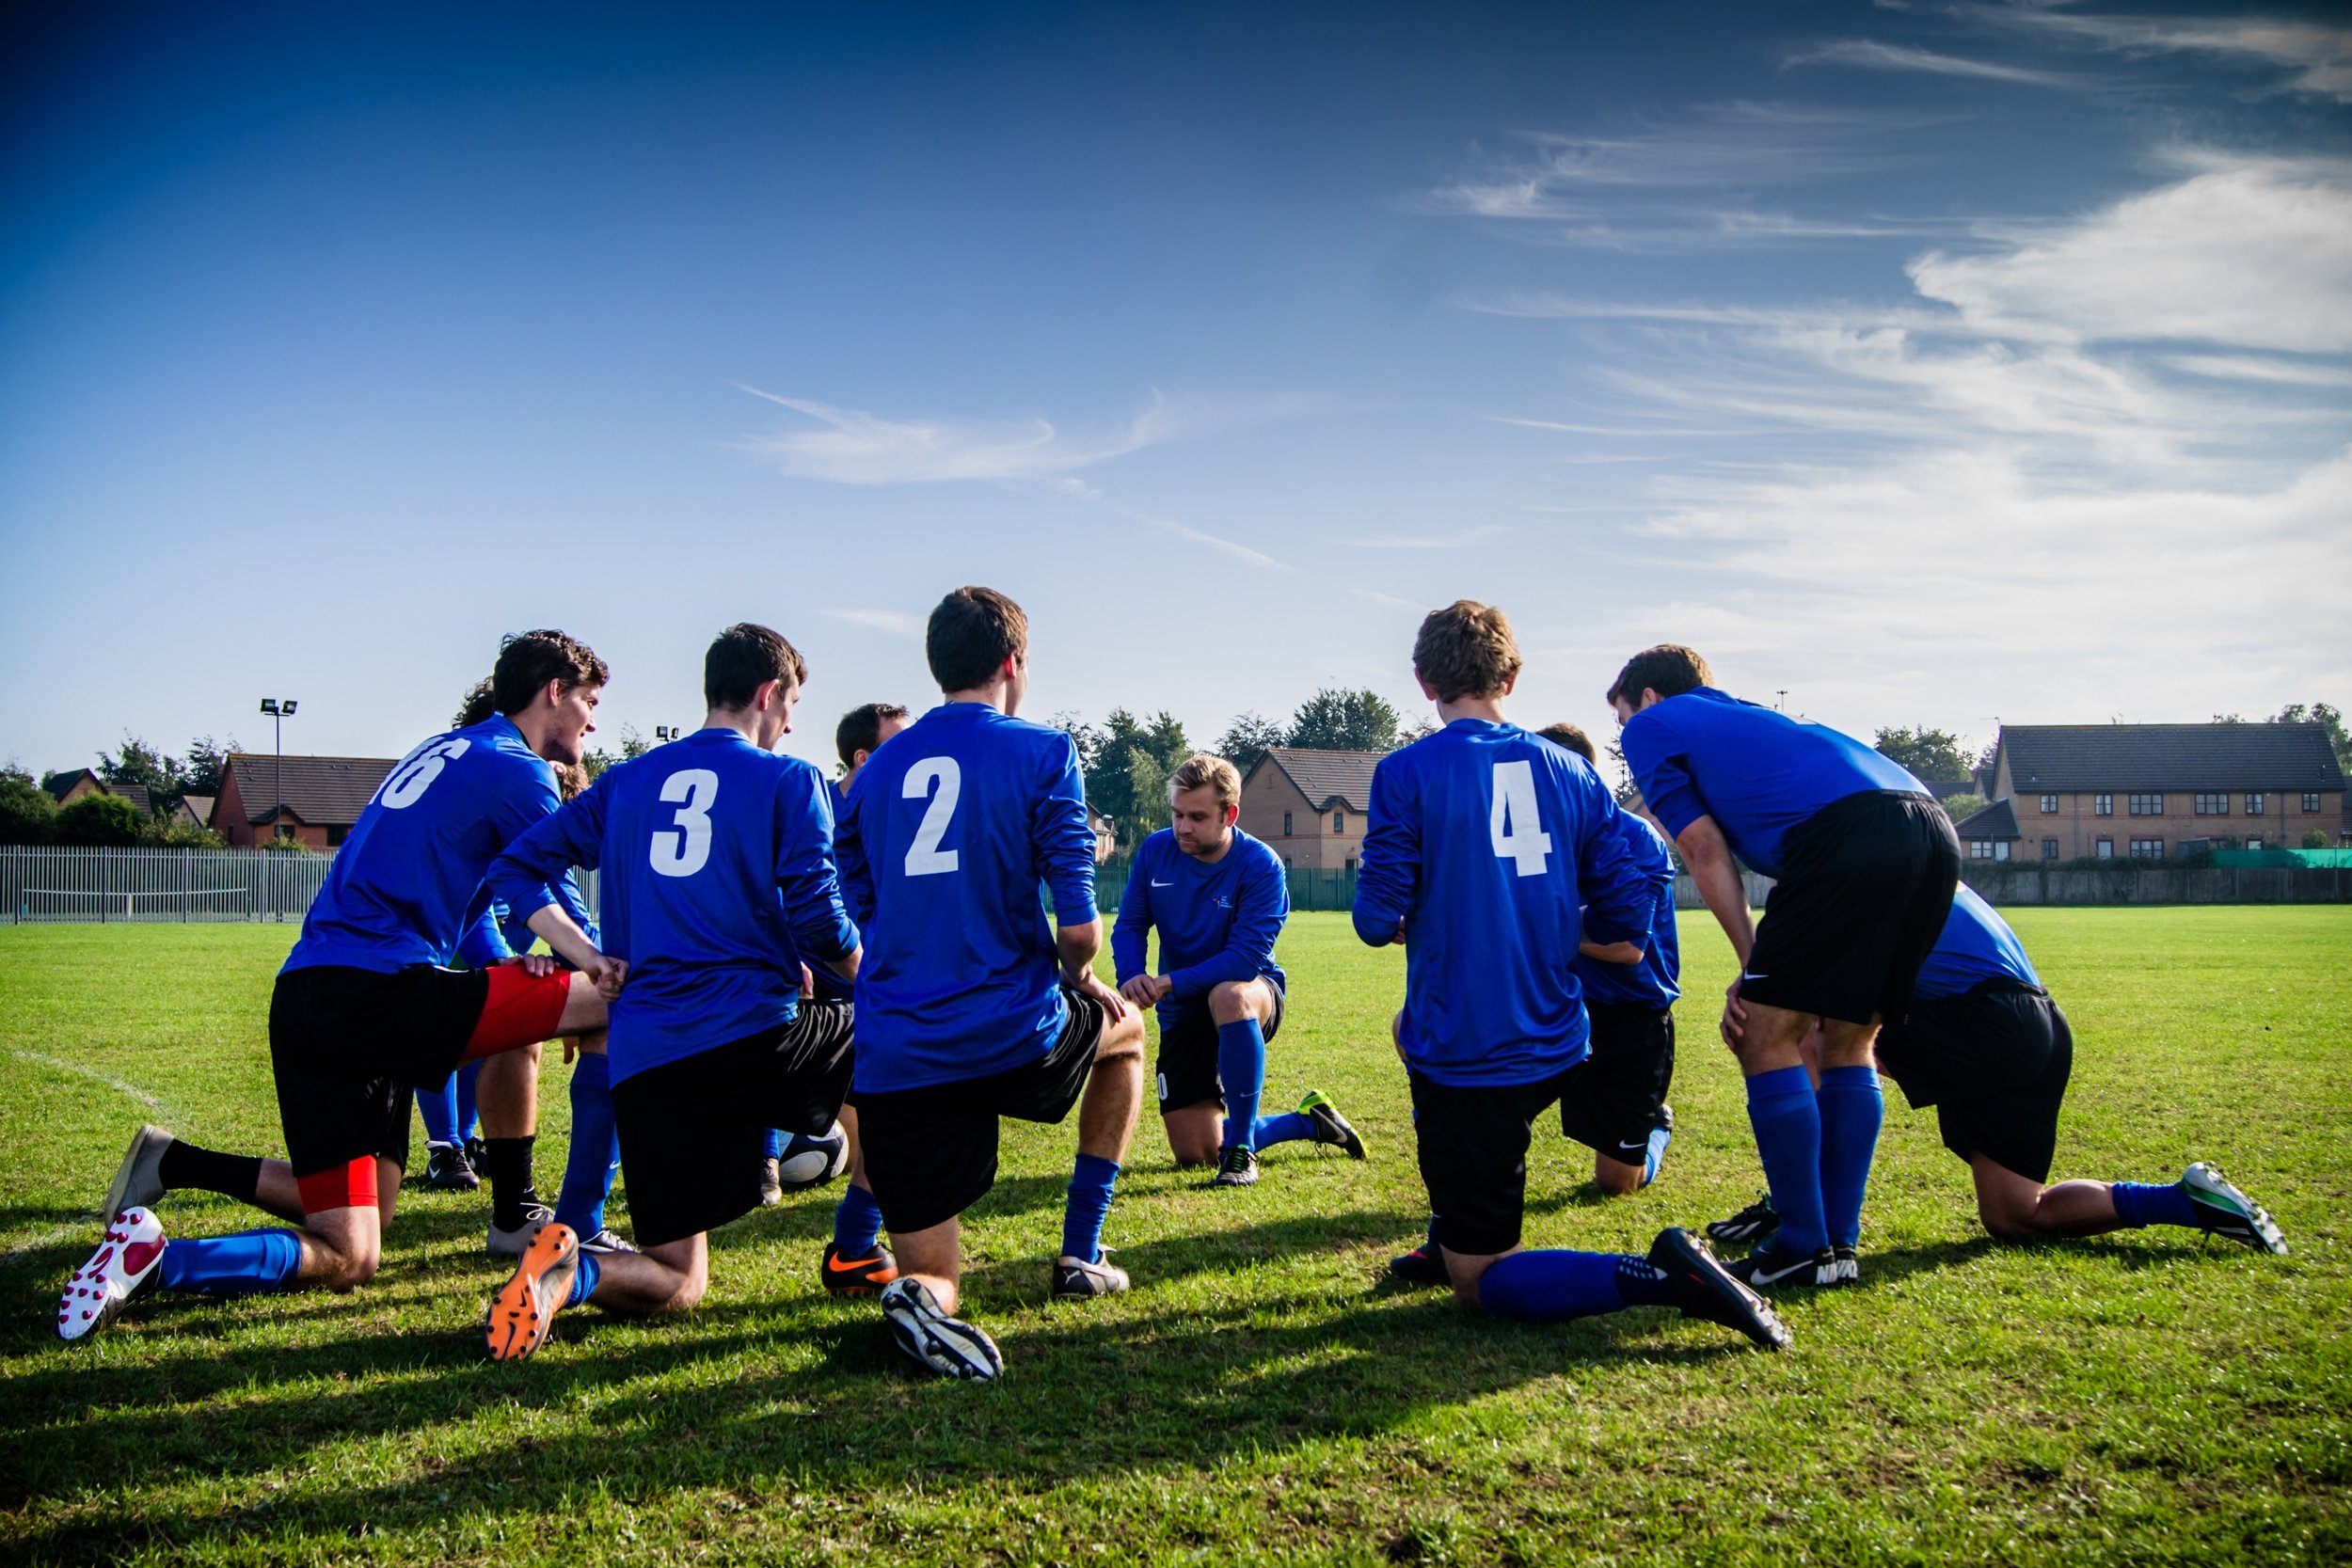 activity-athletes-blue-262524.jpg